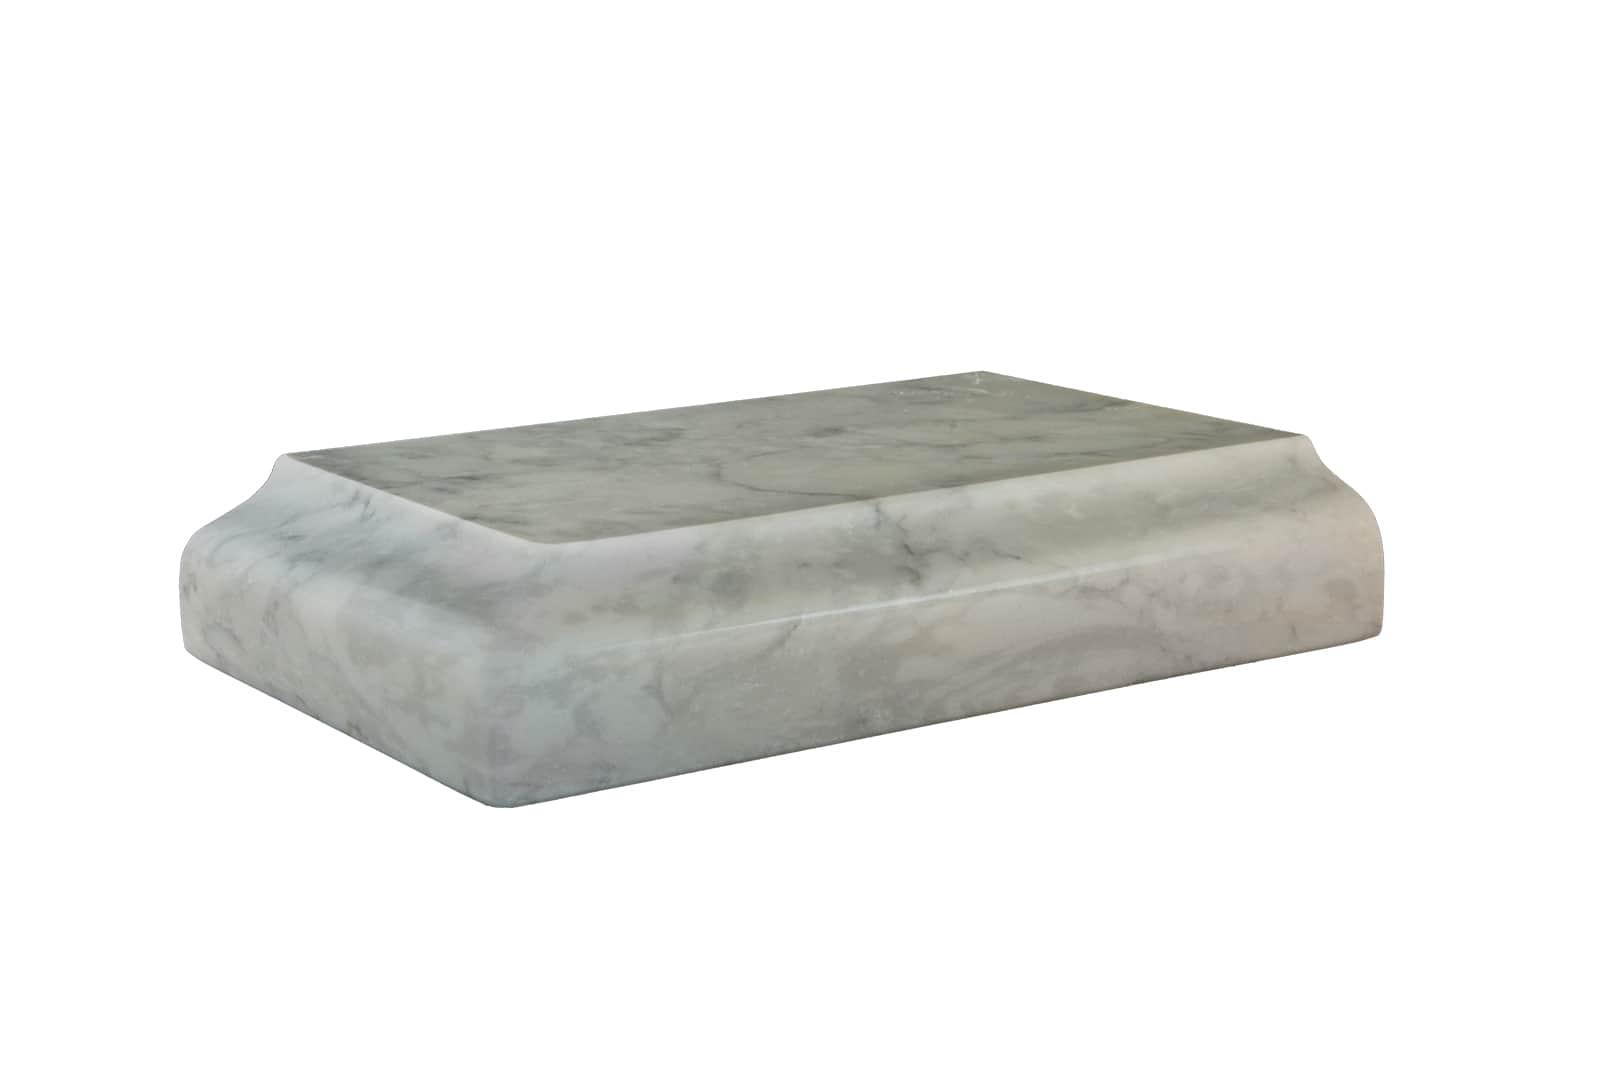 artistic-granite-designs-edges-fabrications-1_25-ogee-flat-bevel-6072